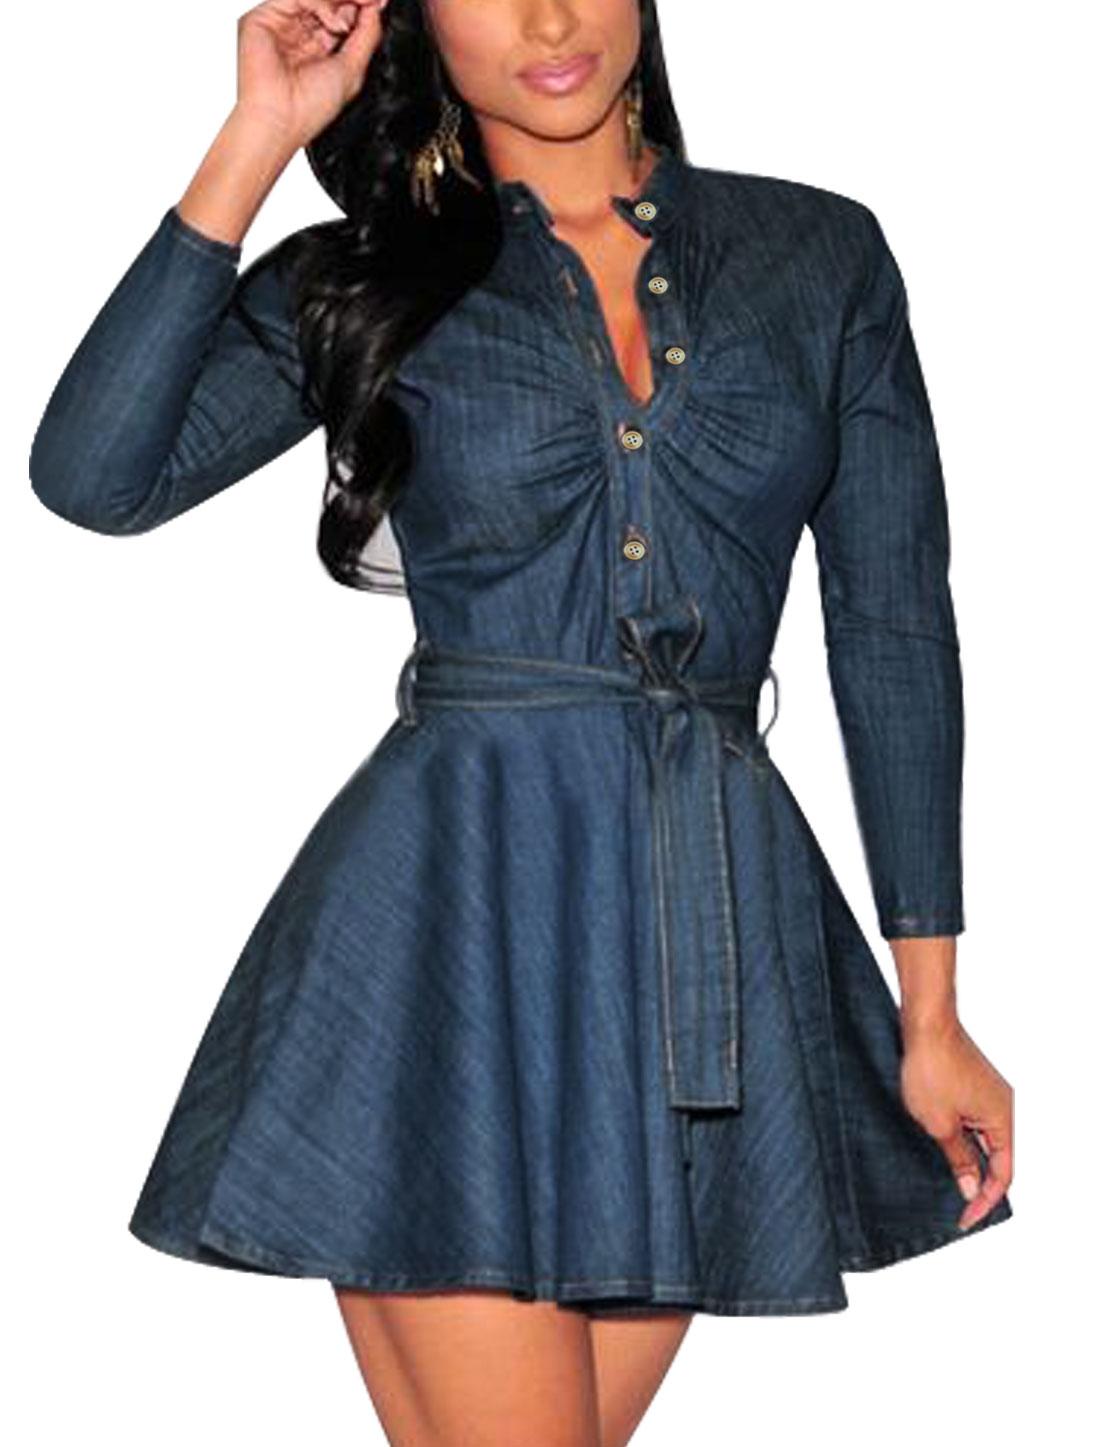 Women Ruched Front Self Tie Belt Half Placket Shirt Dress Blue M